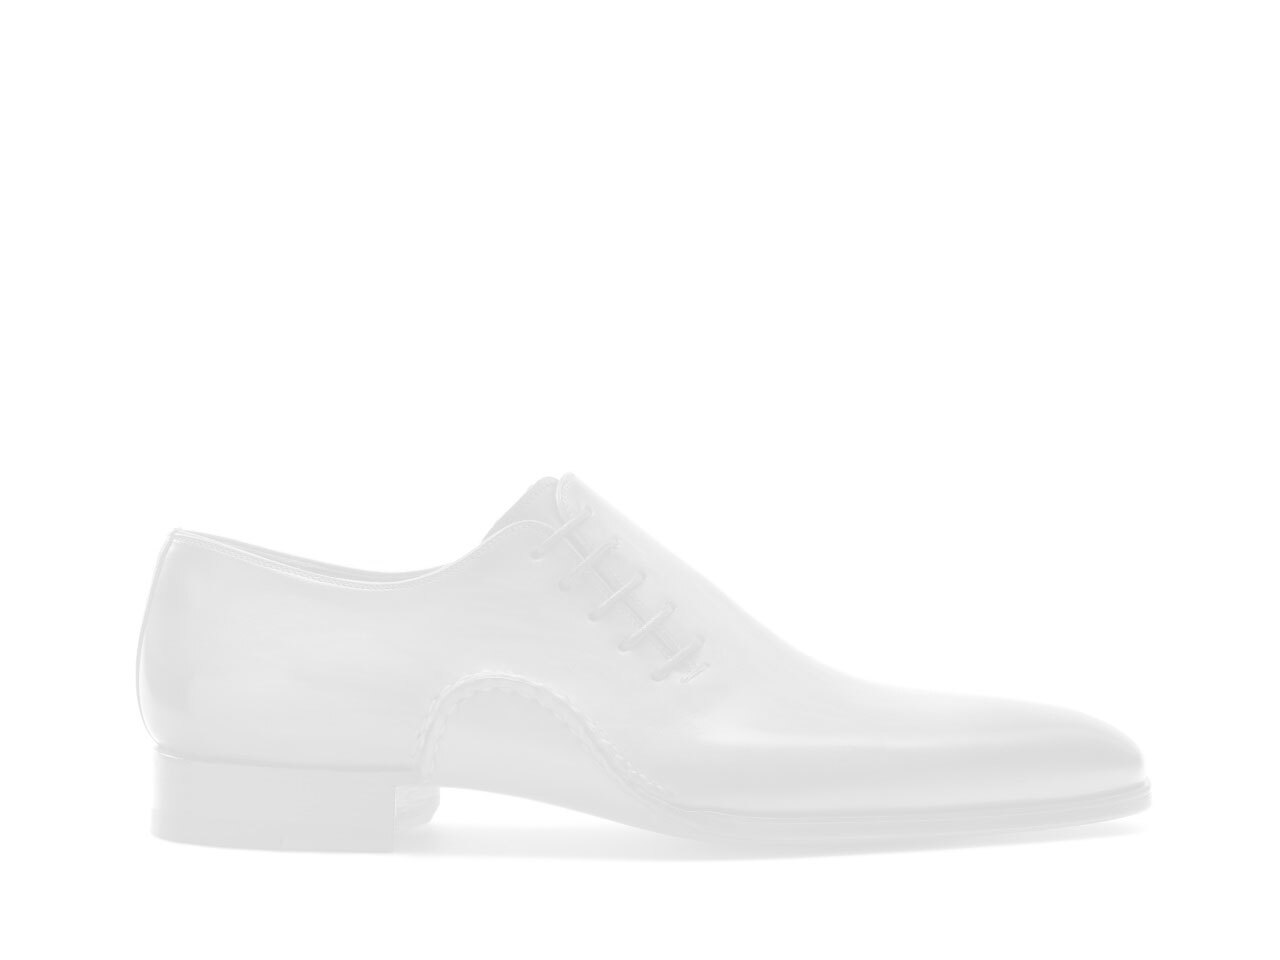 Sole of the Magnanni Merino Midbrown Men's Sneakers